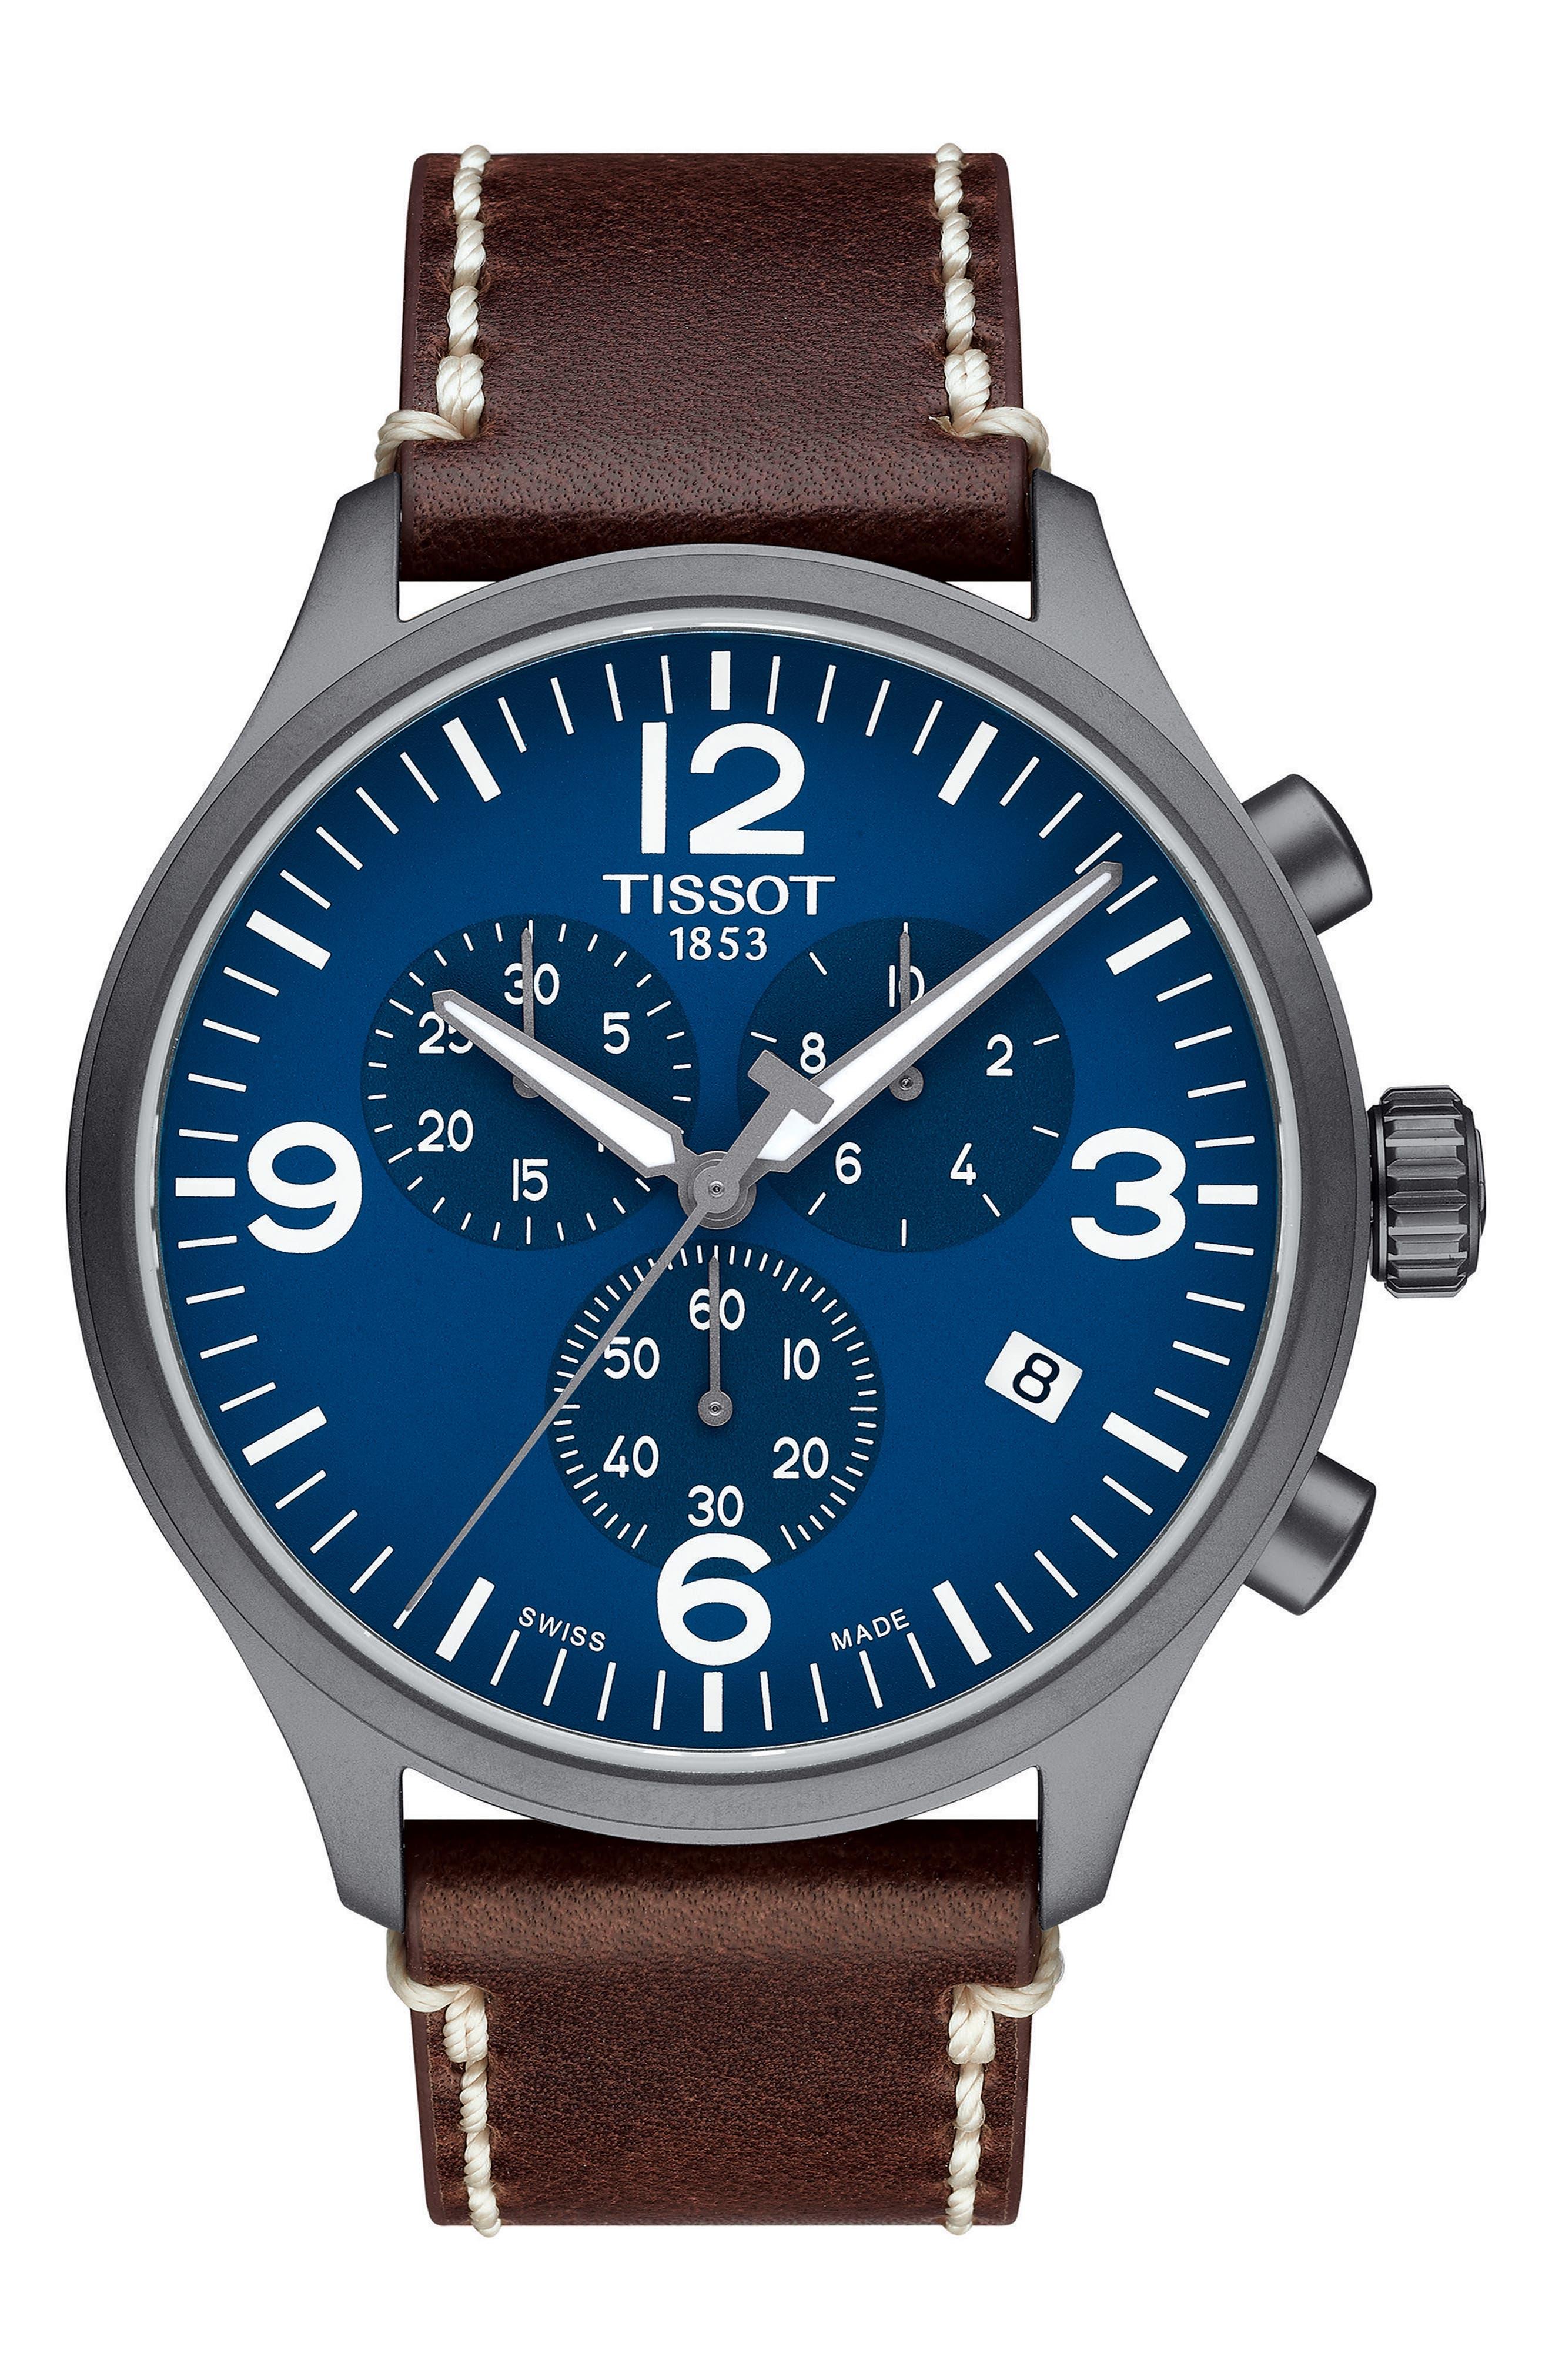 TISSOT,                             Chrono XL Leather Strap Chronograph Watch, 45mm,                             Main thumbnail 1, color,                             BROWN/ BLUE/ BLACK